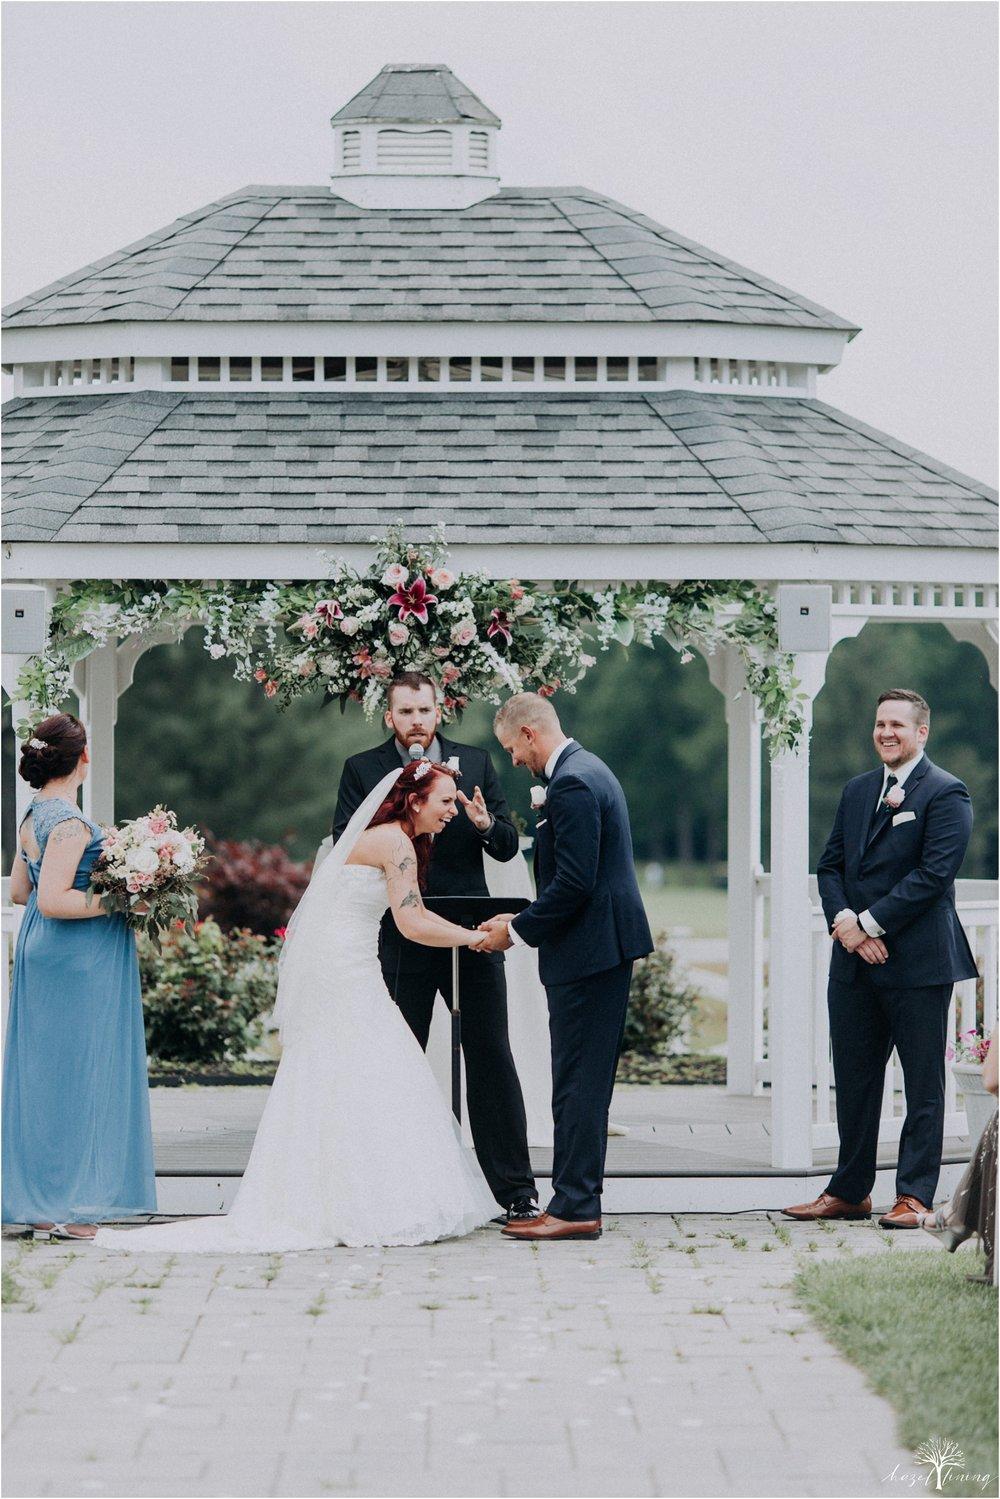 alyssa-james-stiteler-wedding-loft-and-sweet-water-cc-pennsburg-pennsylvania-hazel-lining-travel-wedding-elopement-photography_0055.jpg